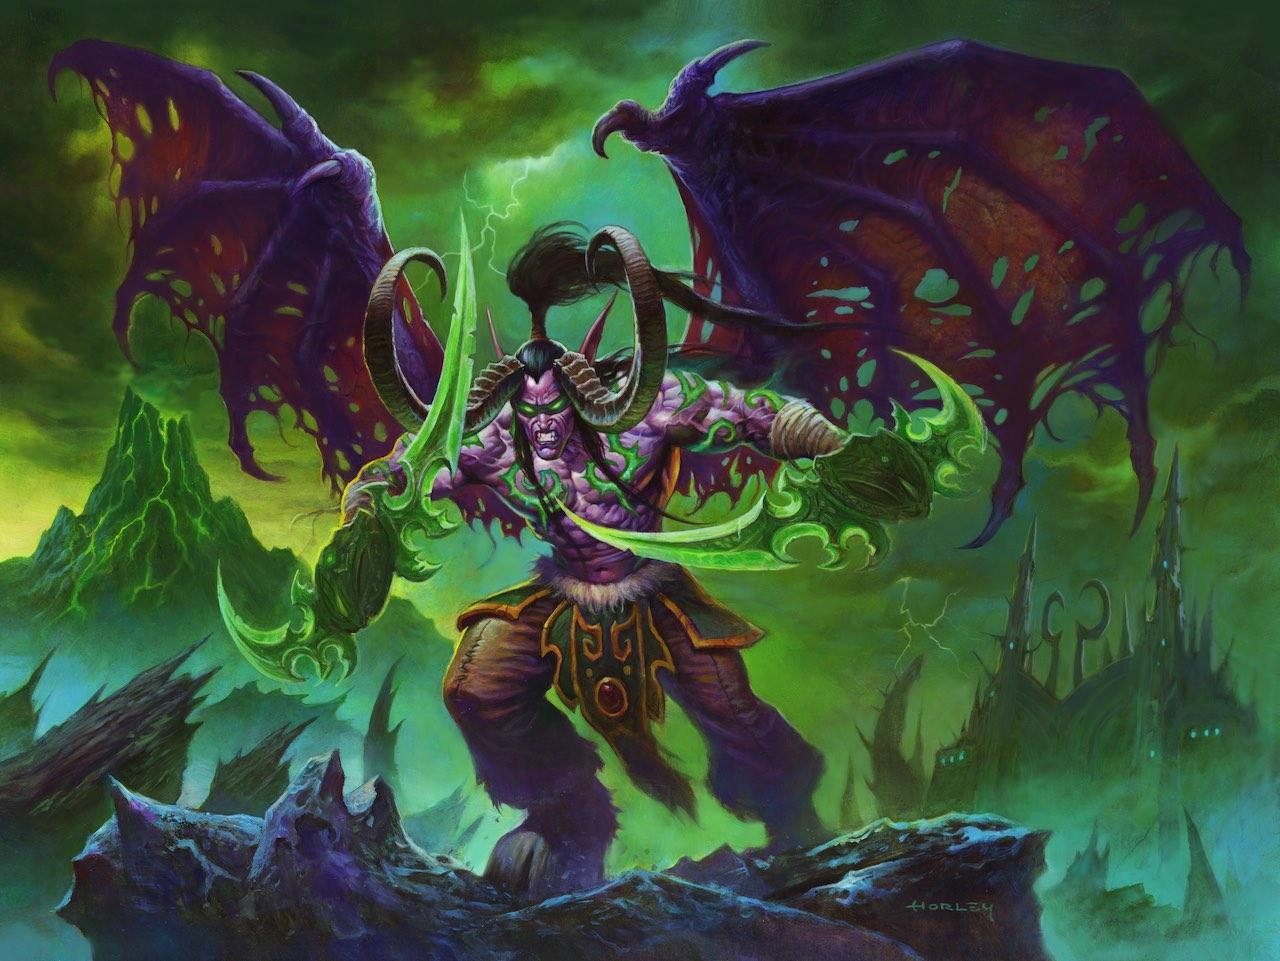 Tempo-Demon-Hunter-deck-list-guide-Scholomance-Academy-Hearthstone-August-2020